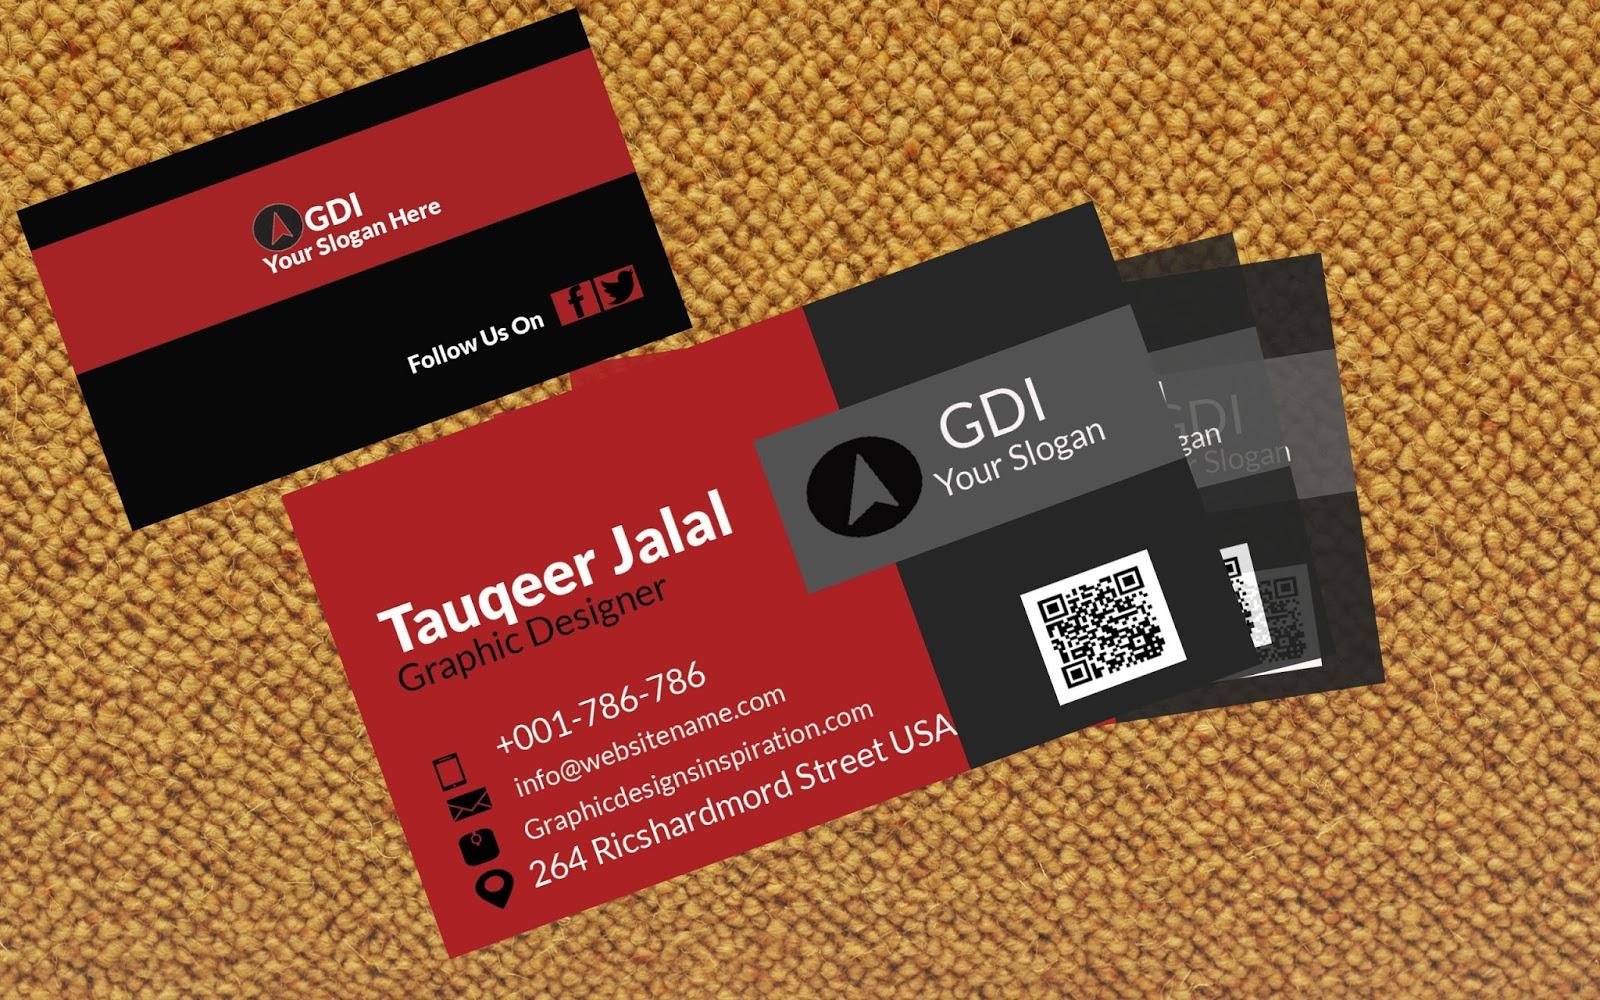 Business Card Design Online - Business Card Tips